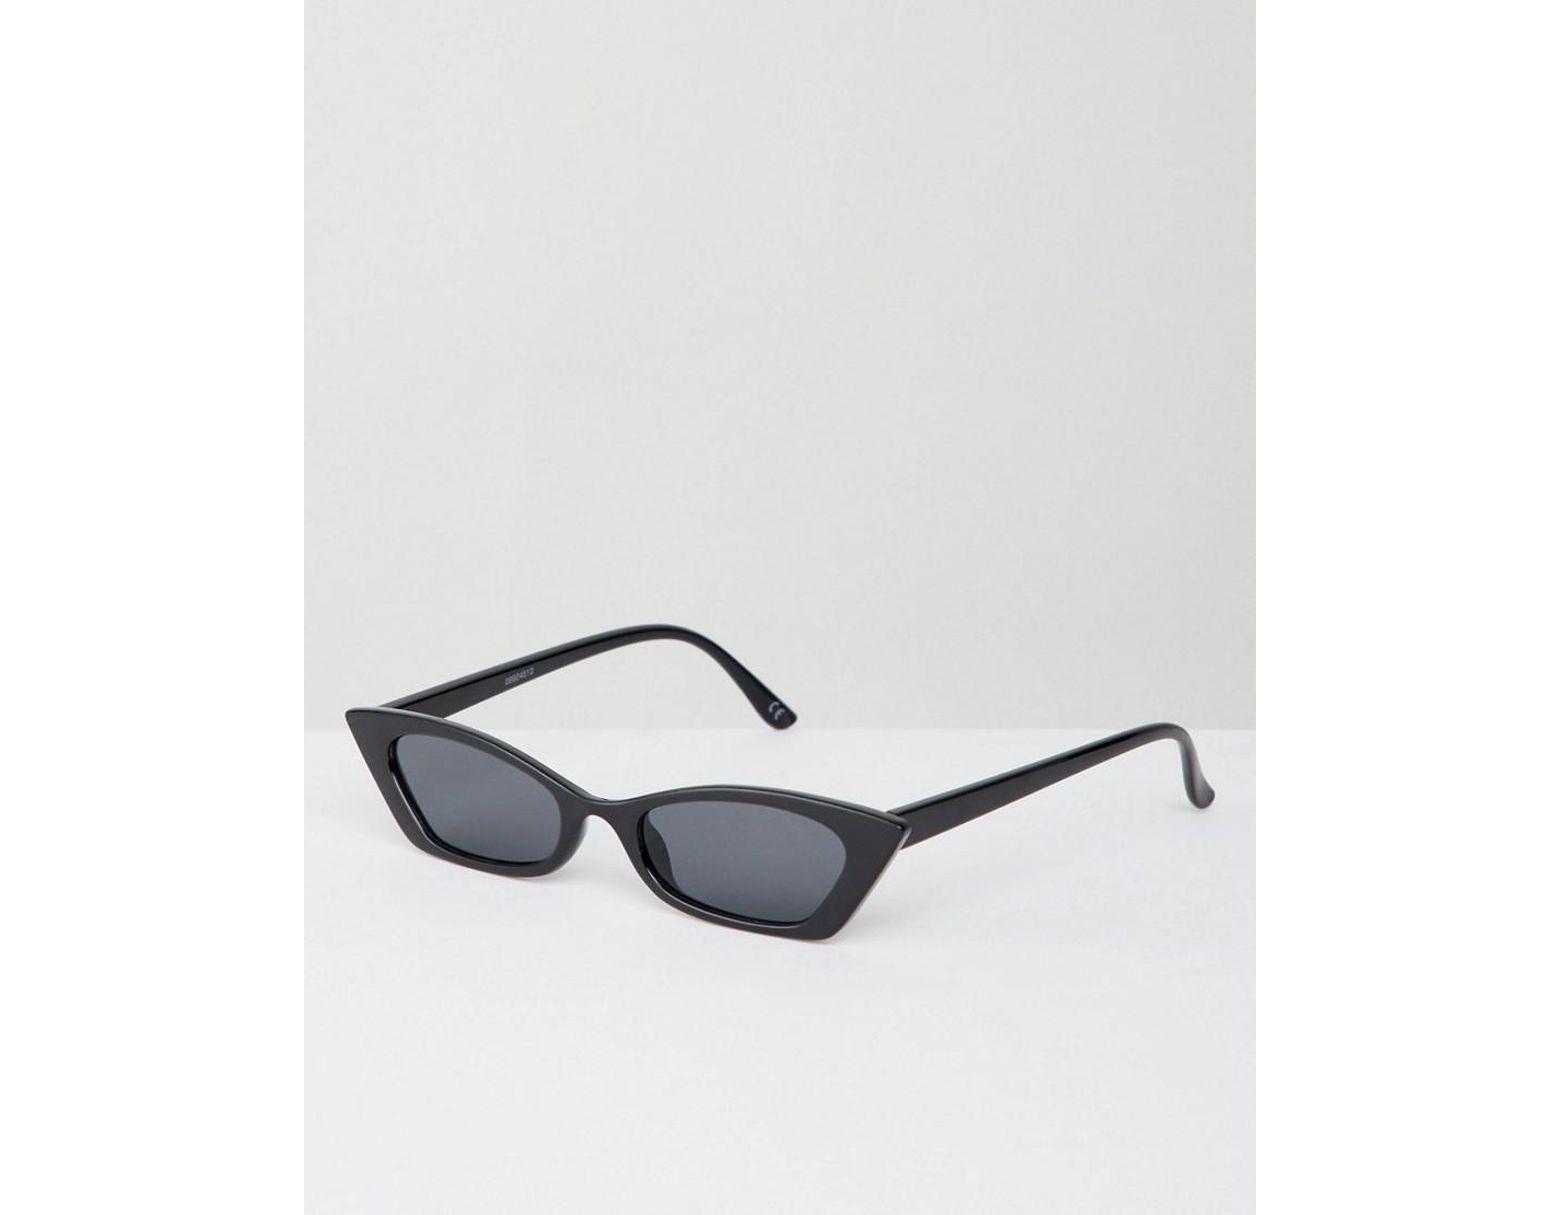 f1ef43268eb4d ASOS Squared Off Narrow Cat Eye Sunglasses in Black - Lyst